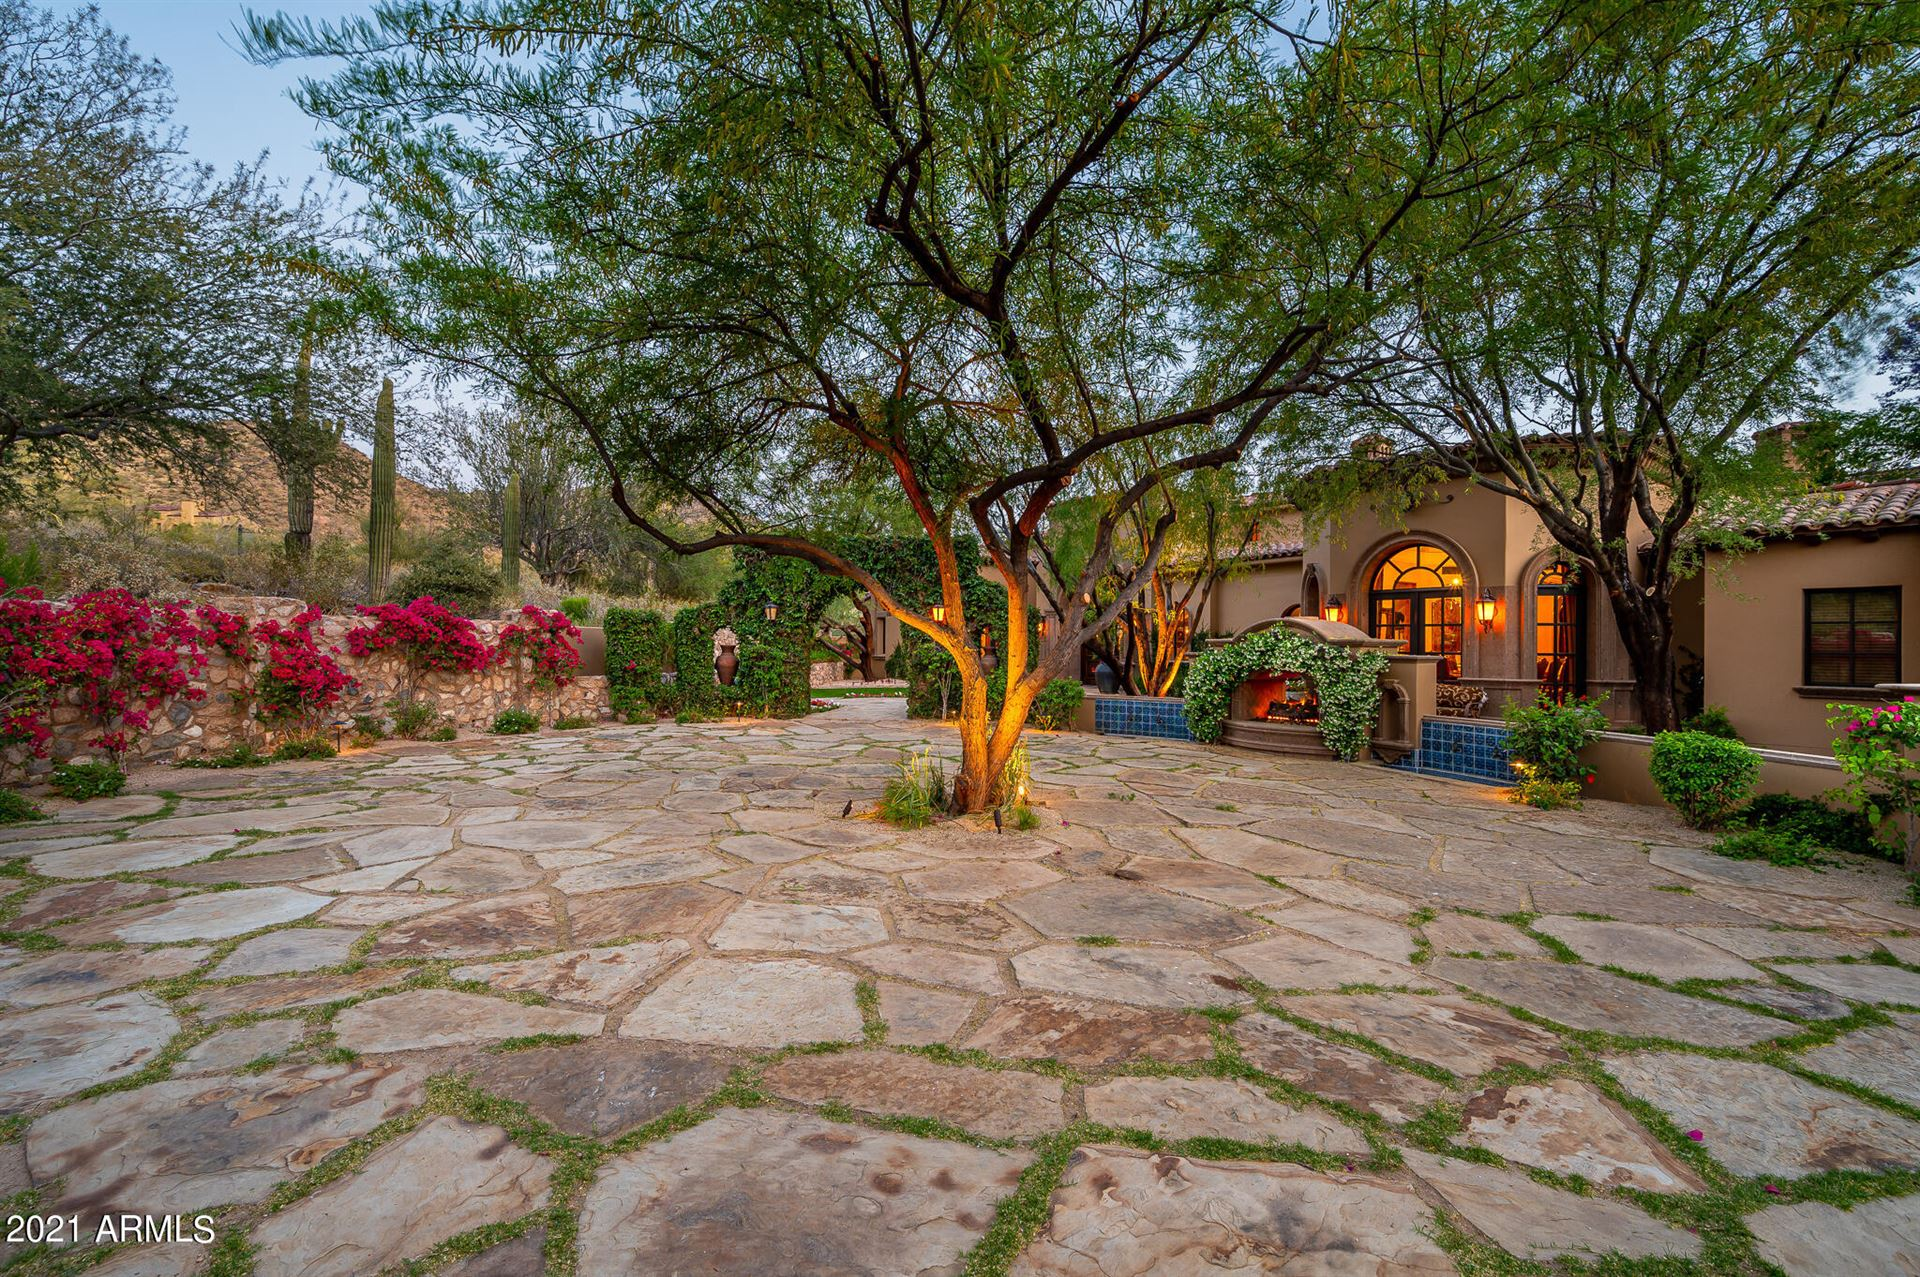 Photo of 10995 E WINGSPAN Way, Scottsdale, AZ 85255 (MLS # 6218123)